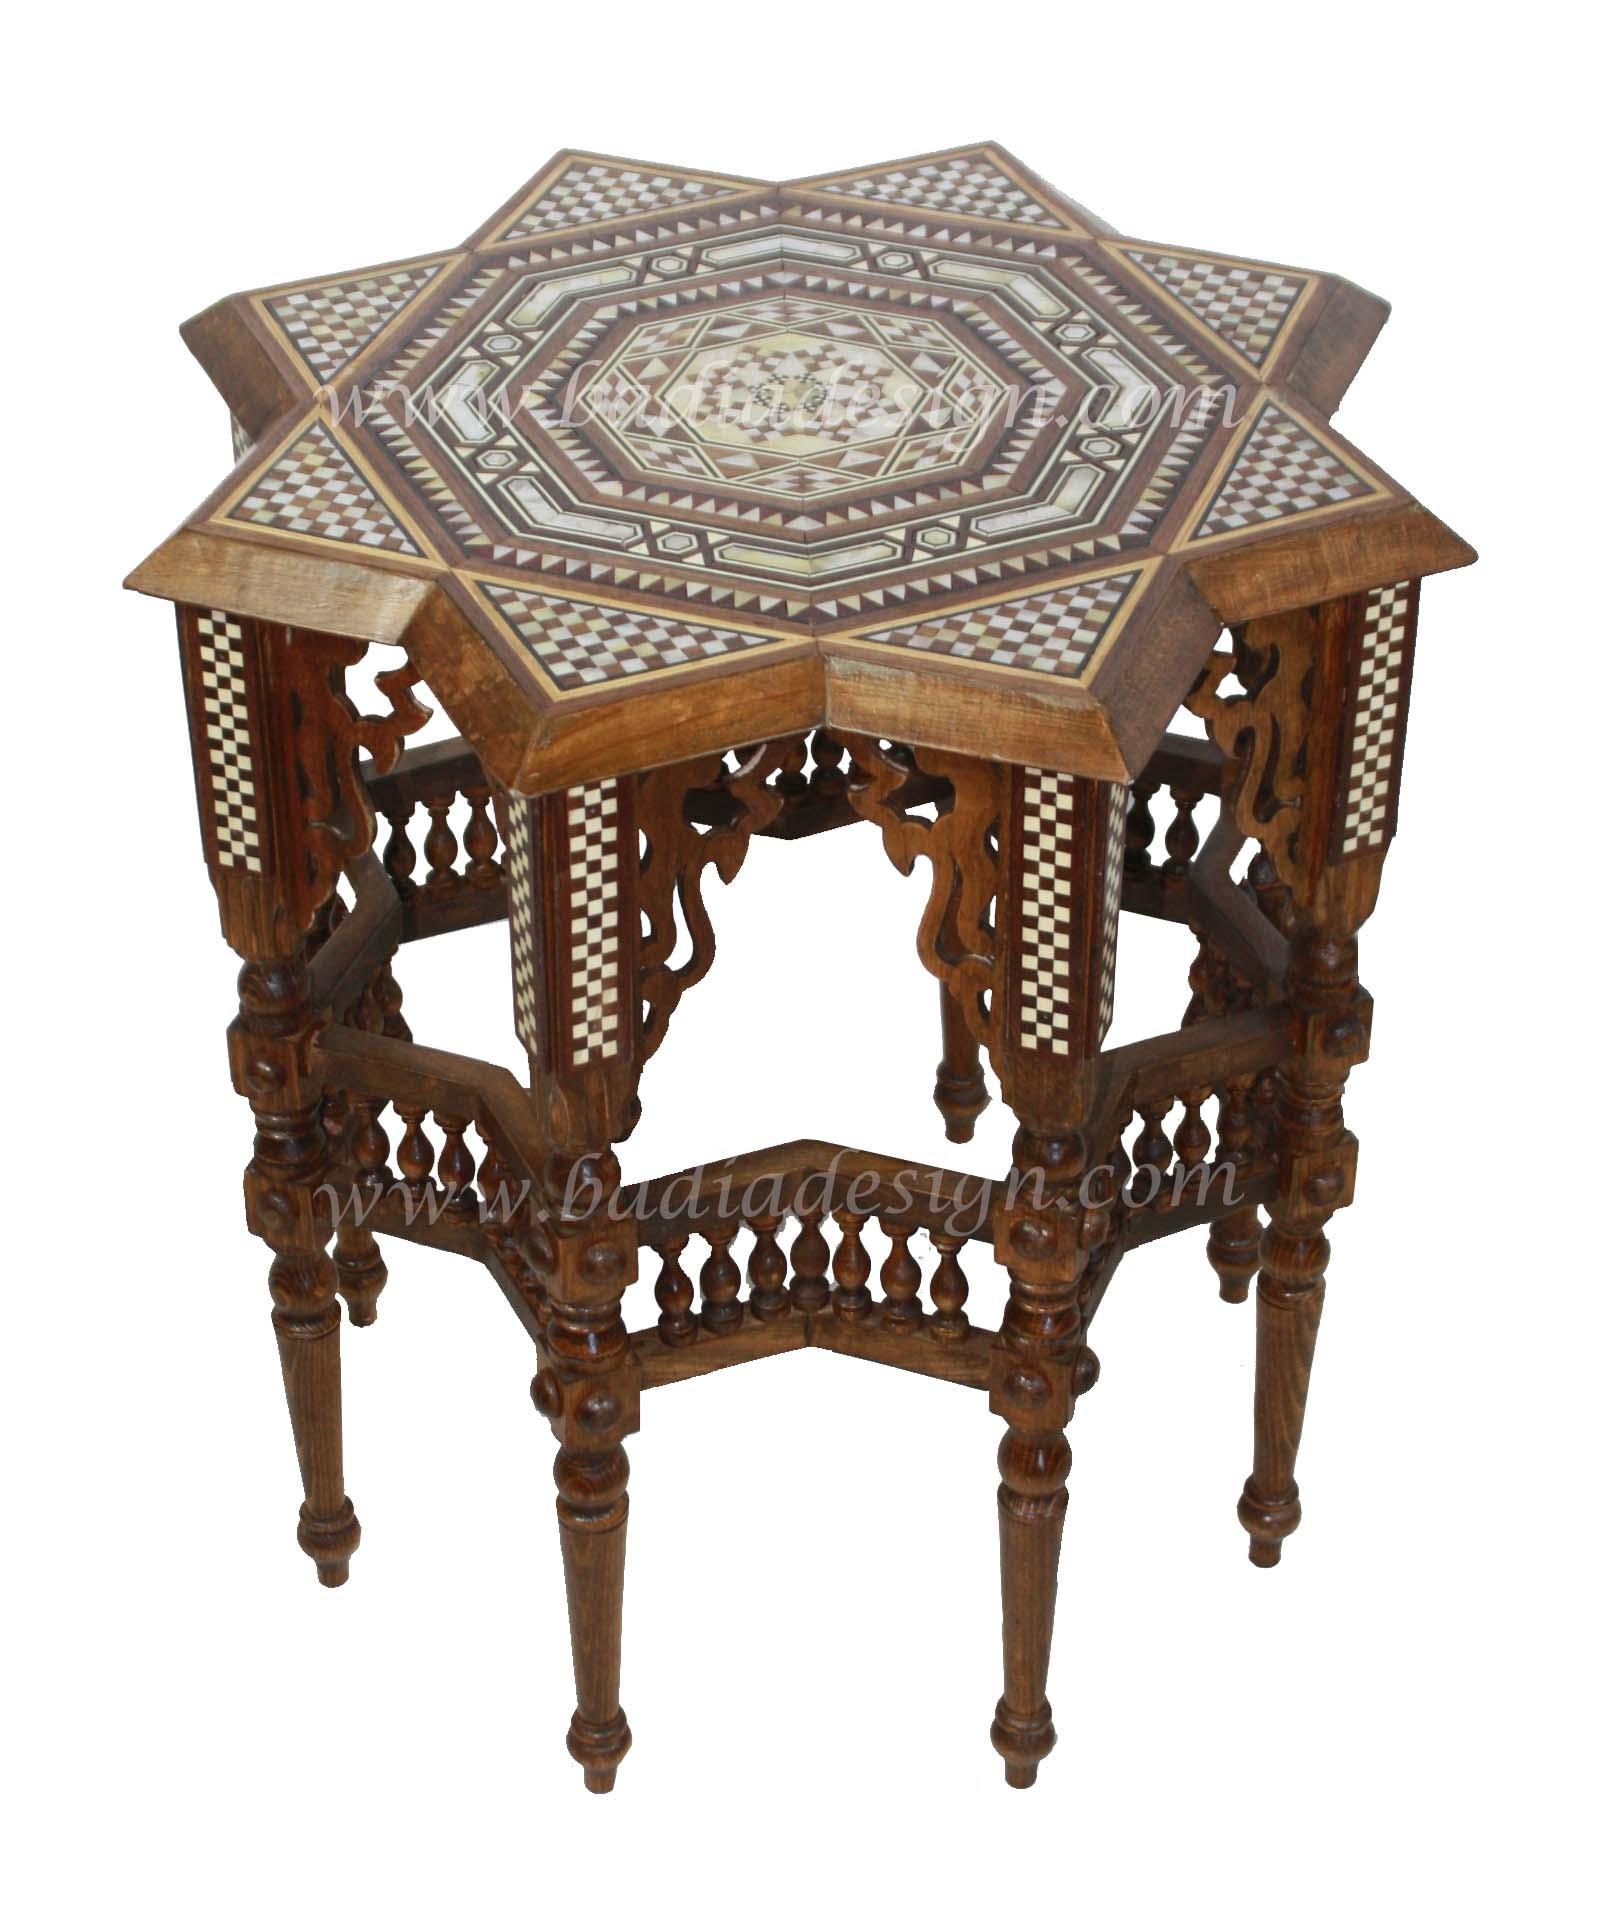 syrian-furniture-mop-st062-1.jpg